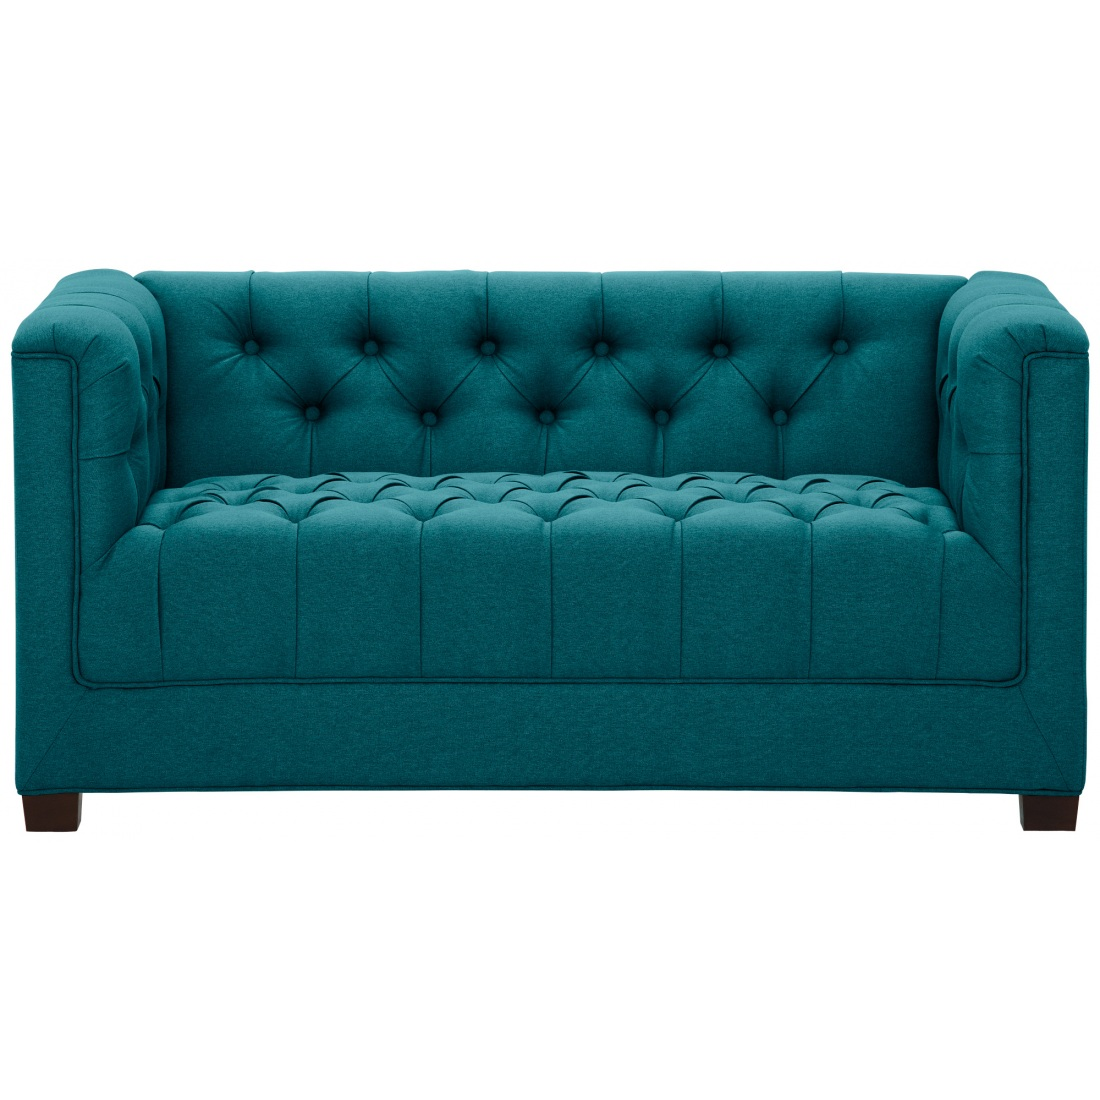 Full Size of Türkis Sofa 2 Sitzer Trkis Designer Couch Moebel Liebecom Mit Schlaffunktion Bettkasten Led Ikea Bettfunktion Big Kolonialstil Leder Braun Microfaser Hocker Sofa Türkis Sofa